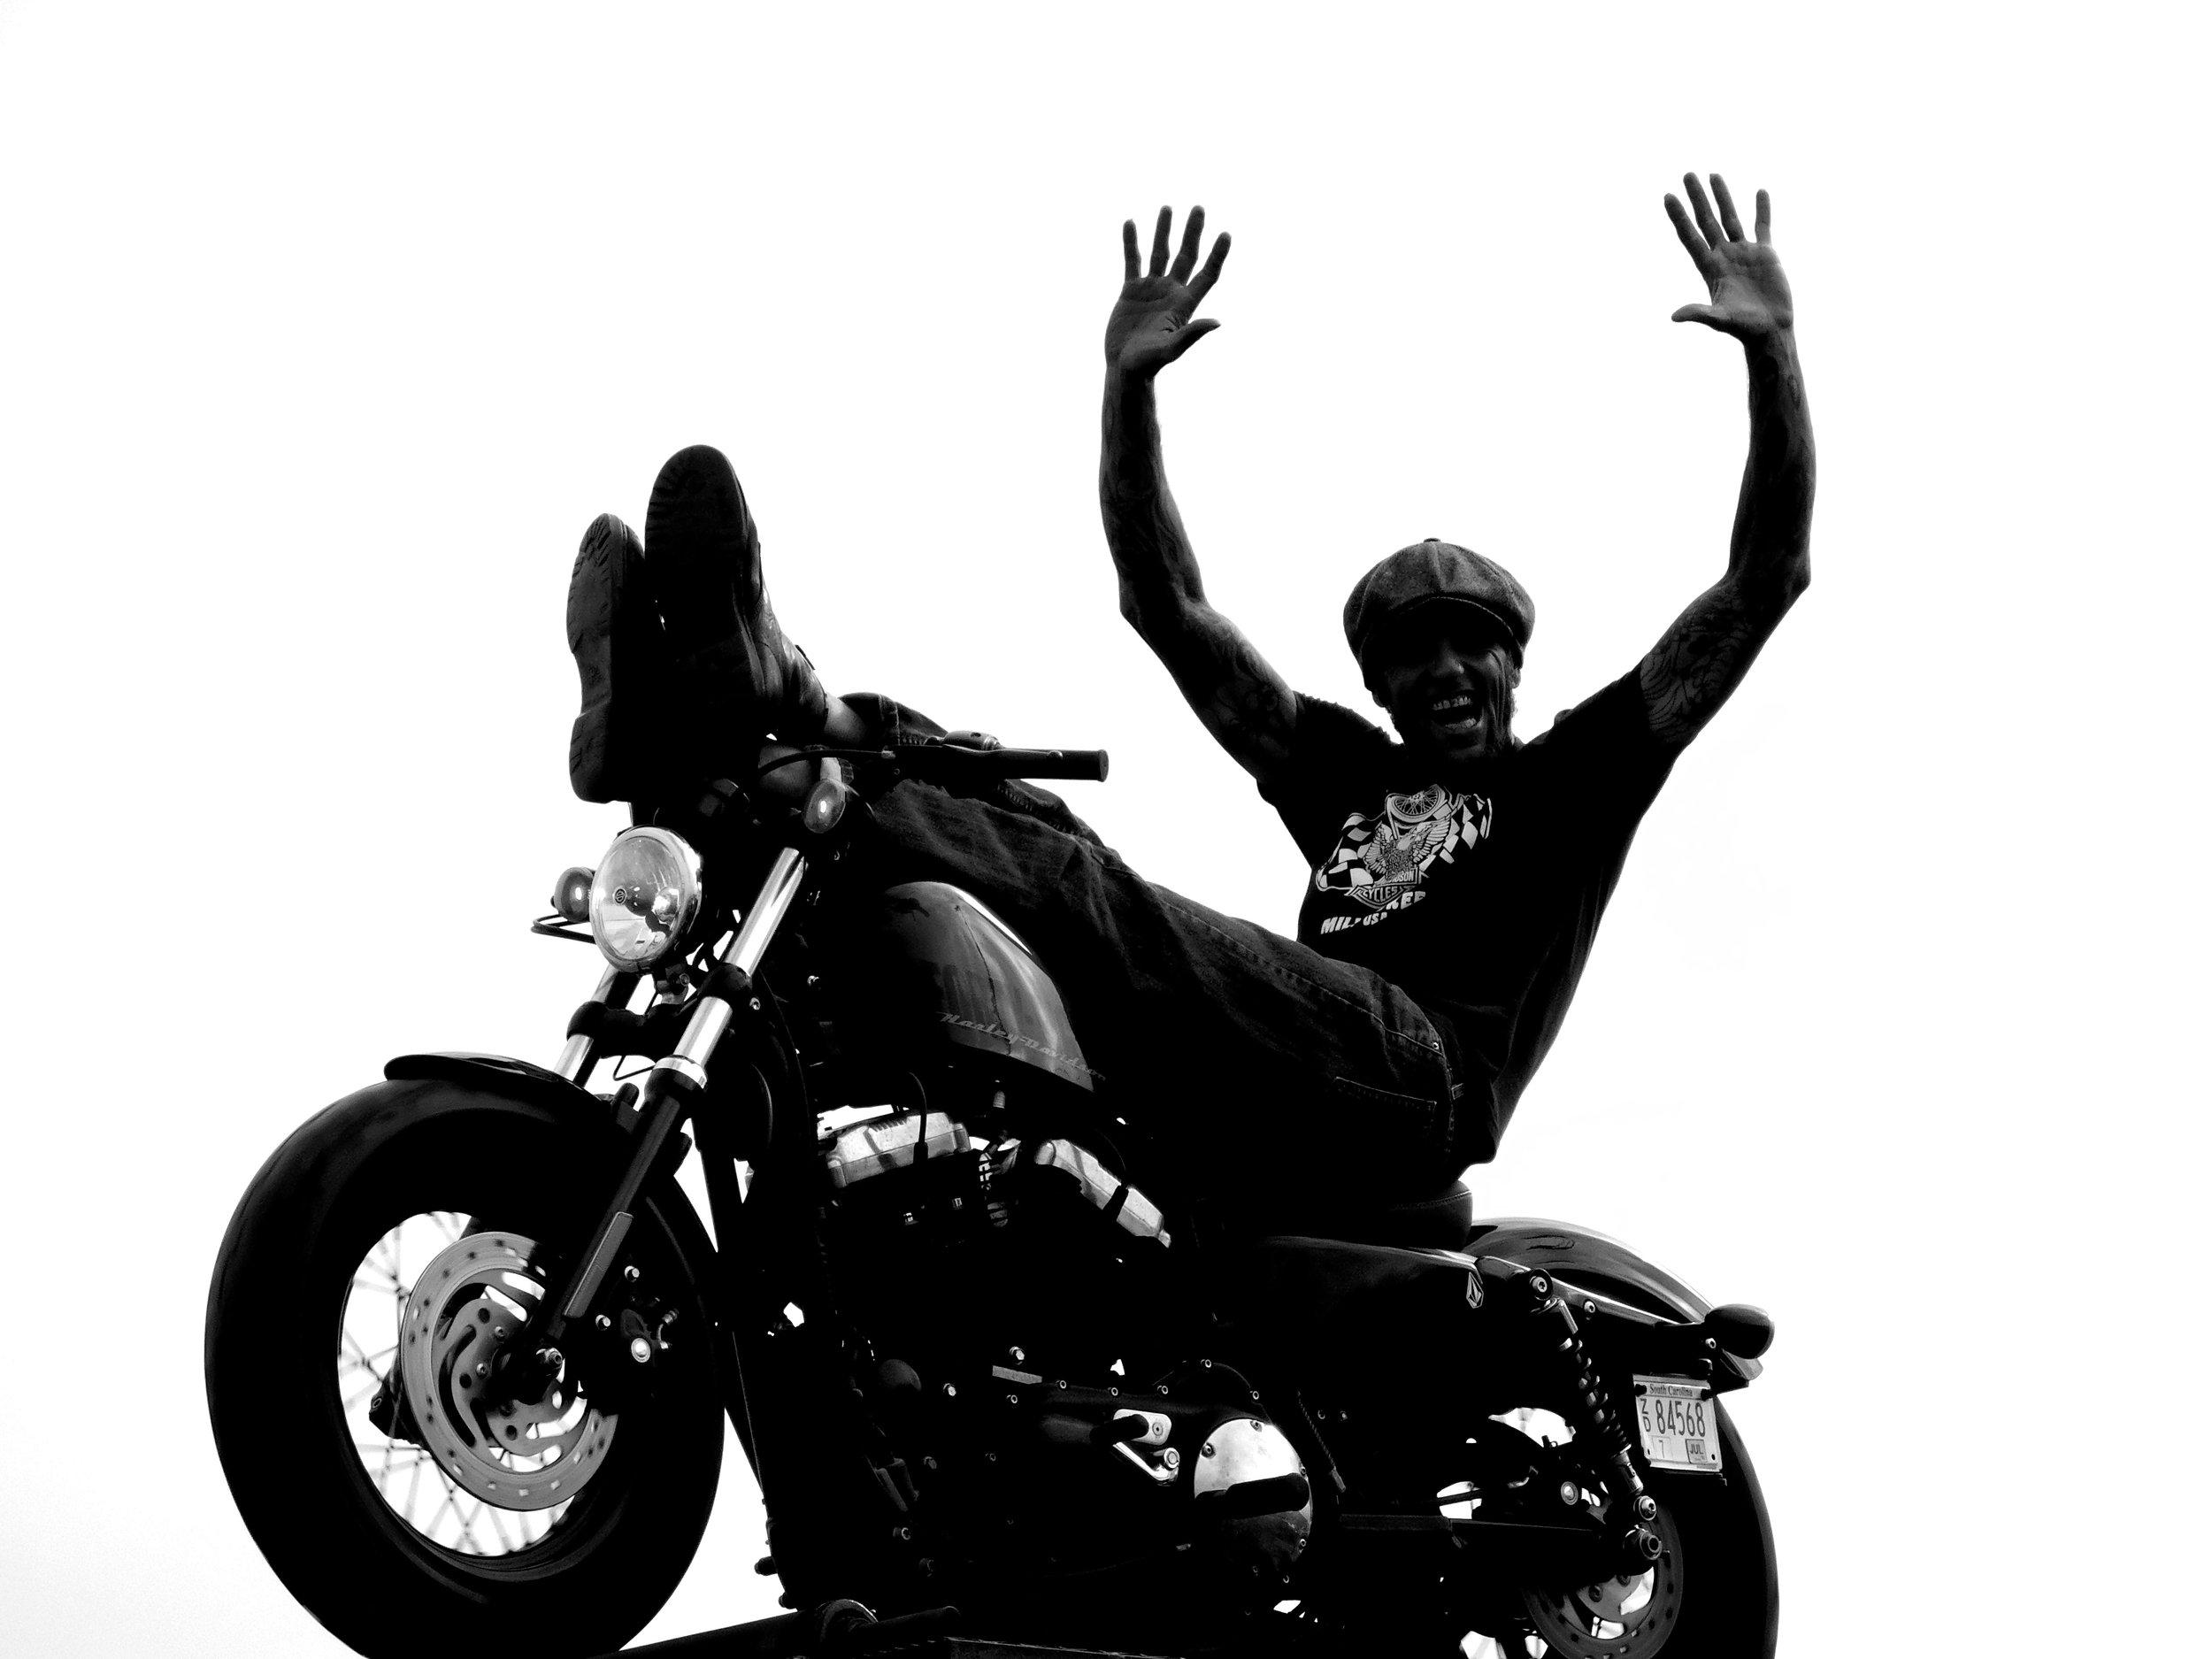 Rhett Rotten, Stuntman for The Wall of Death Riders